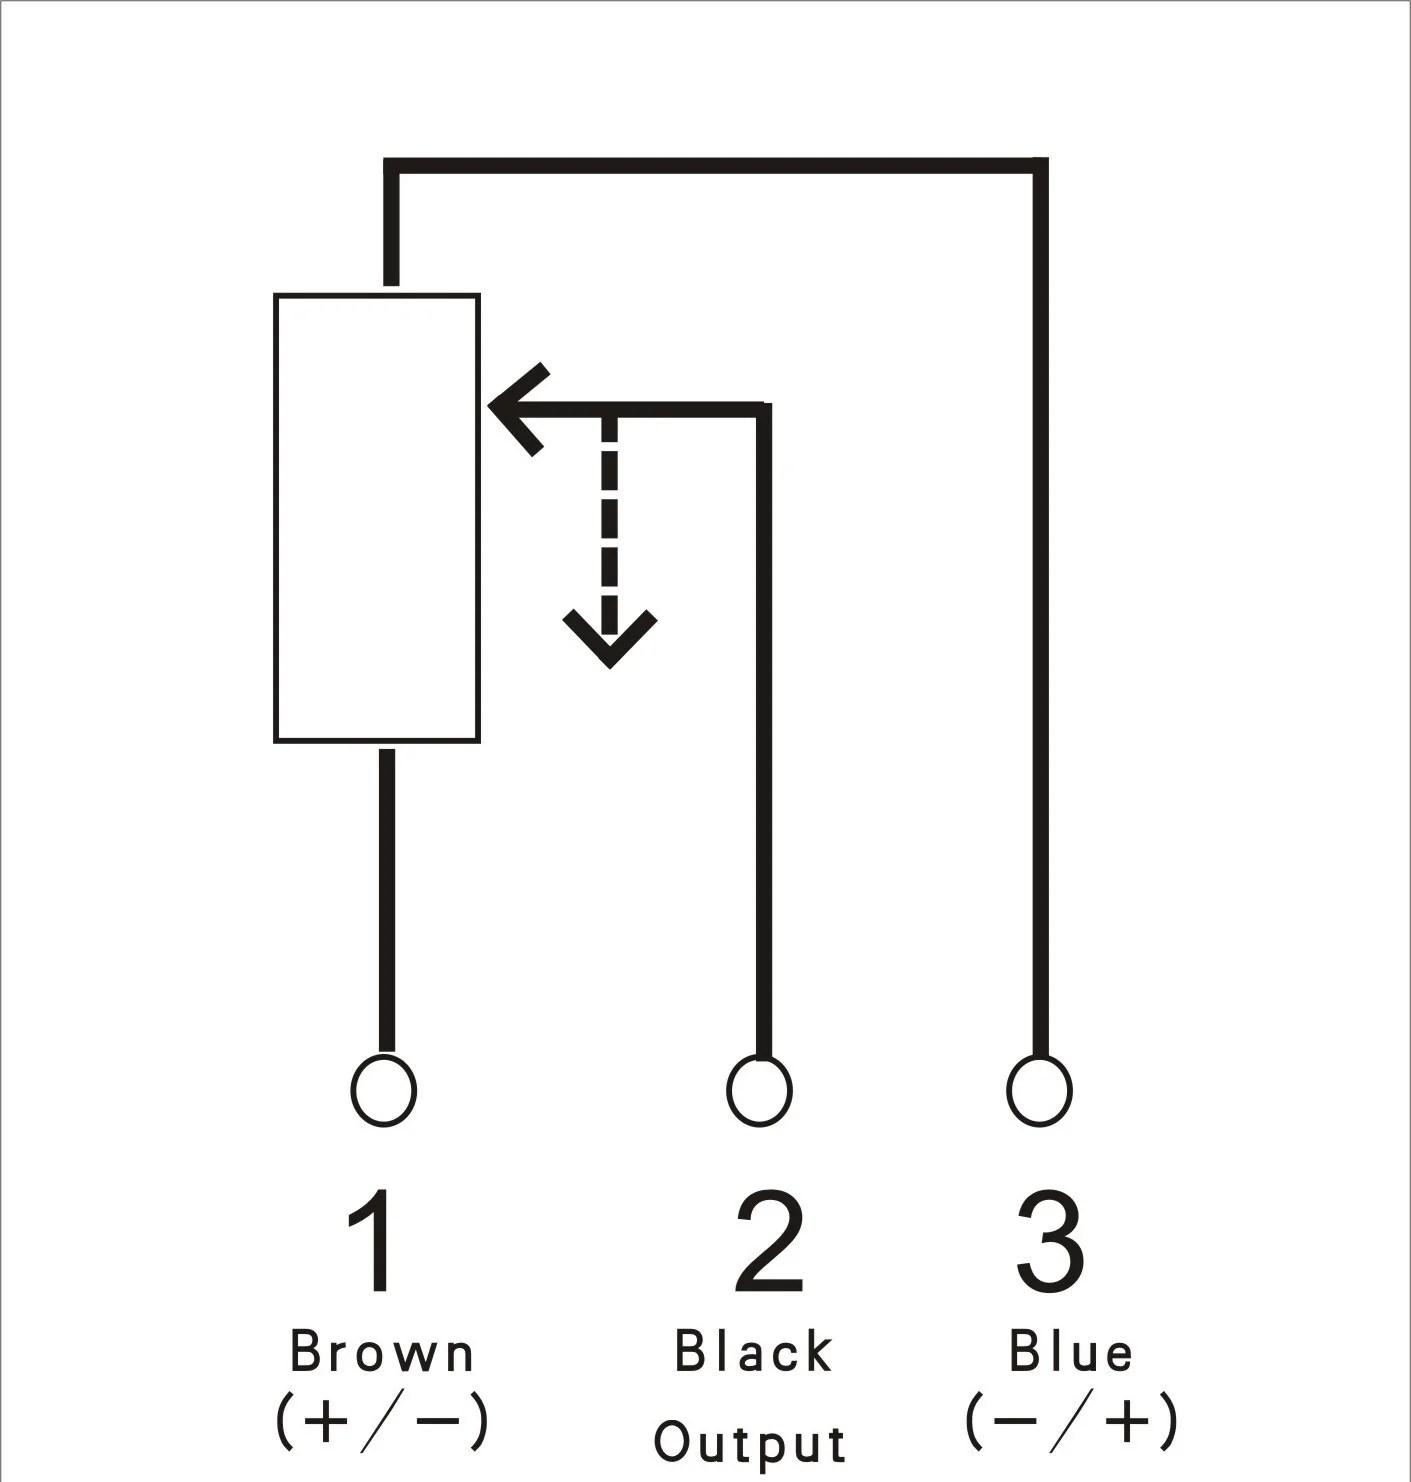 medium resolution of potentiometer wiring diagram wiring diagrams lol for a 10k potentiometer wiring diagrams little wiring diagrams joystick